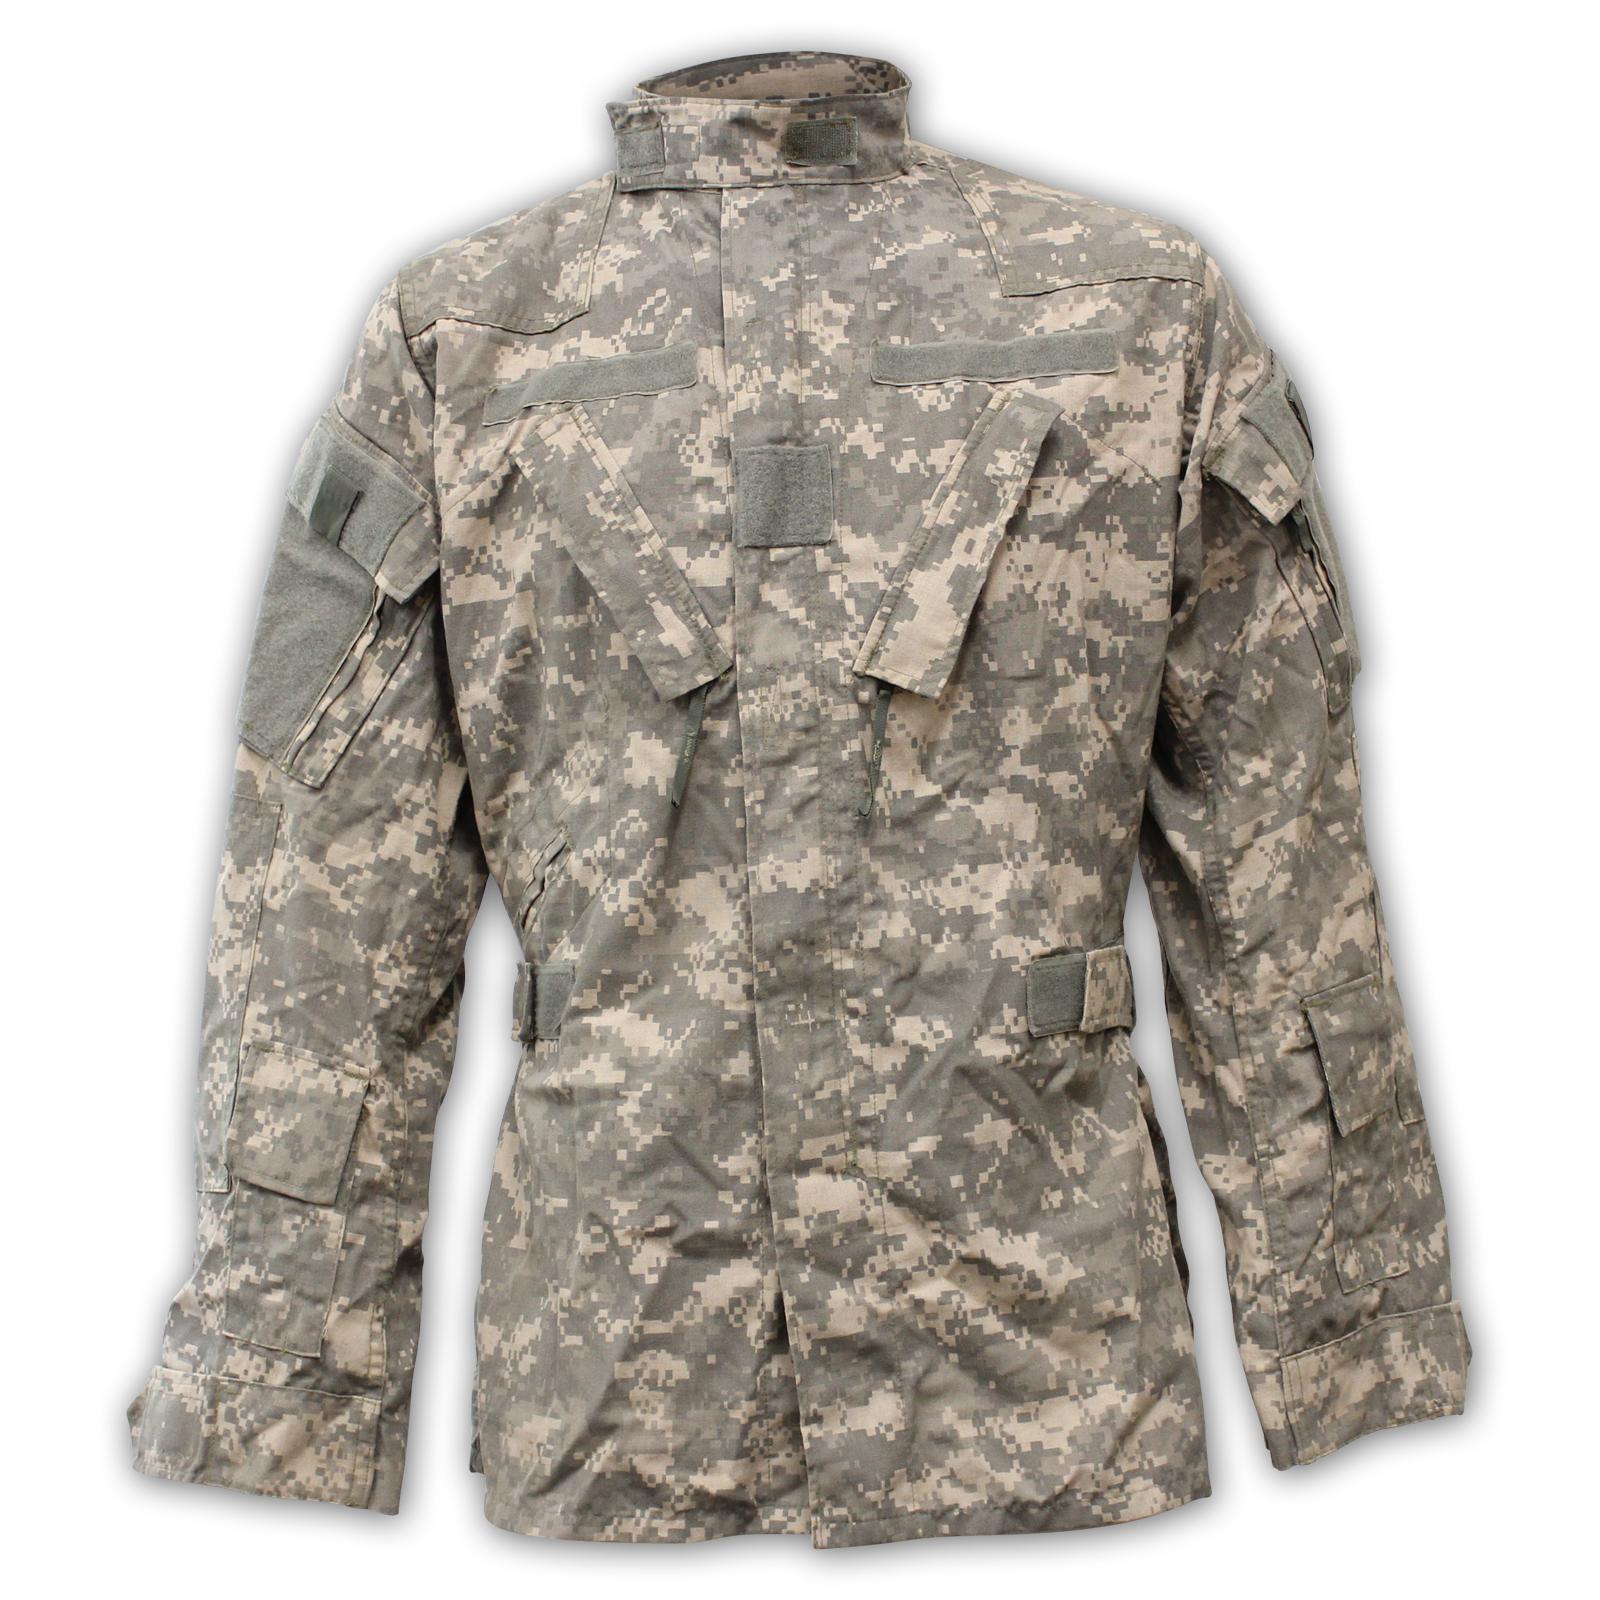 MILITARY SURPLUS US Acu (Army Combat Uniform) Shirt